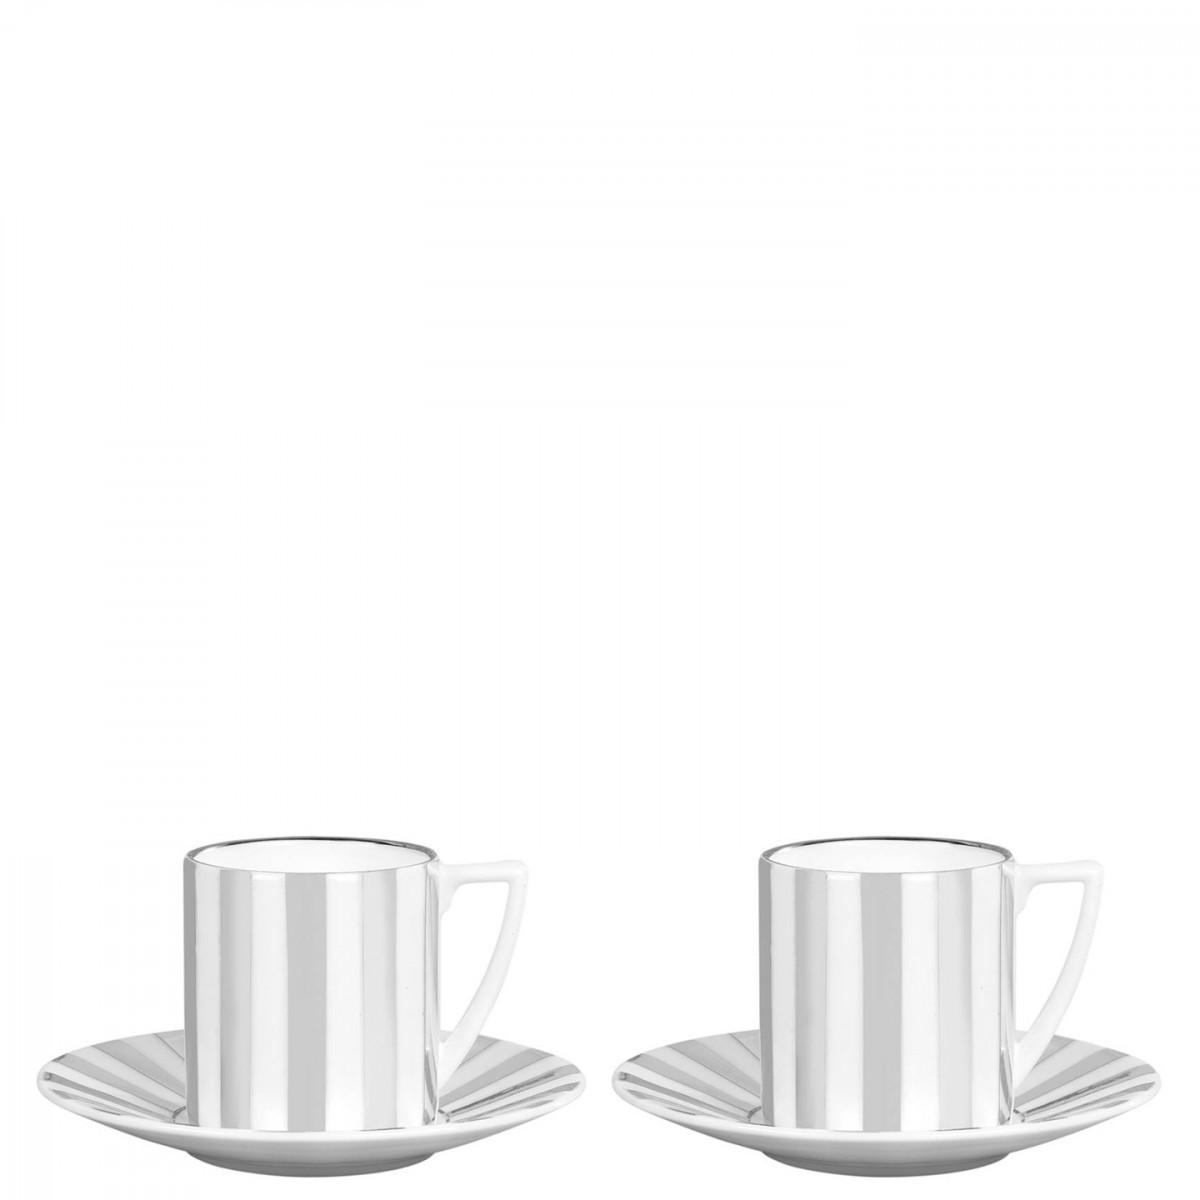 wedgwood bone china wild strawberry vase of jasper conran platinum espresso cup and saucer set of 2 wedgwooda uk with jasper conran platinum espresso cup and saucer set of 2 gift boxed